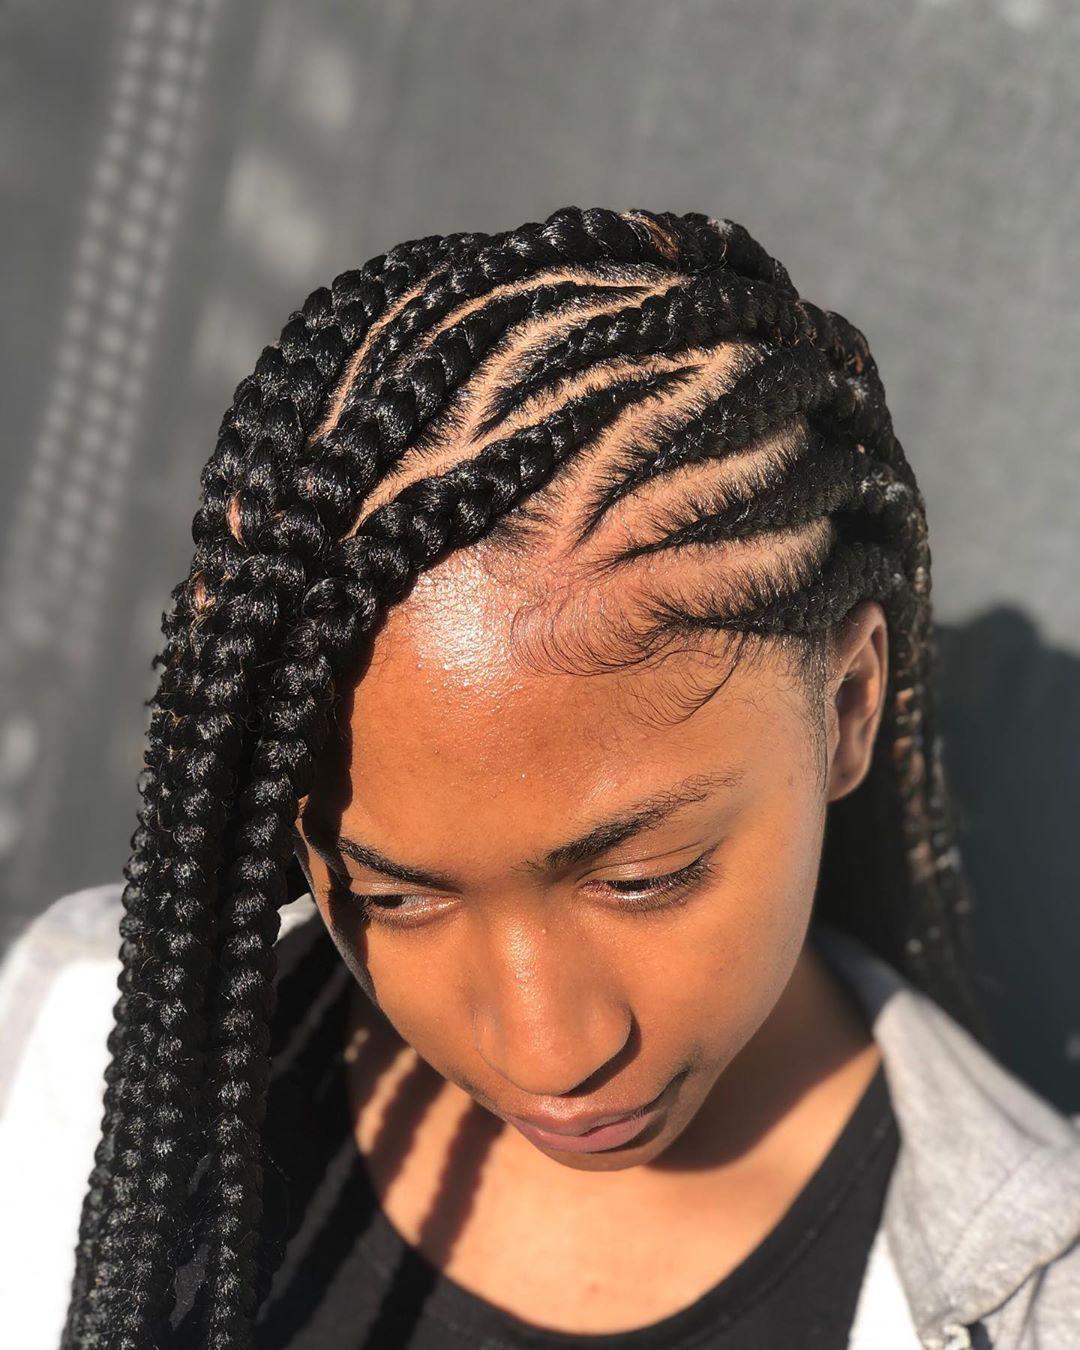 Curvy-Cornrow-Braids Braids Hairstyles 2020 for Ultra Stylish Looks